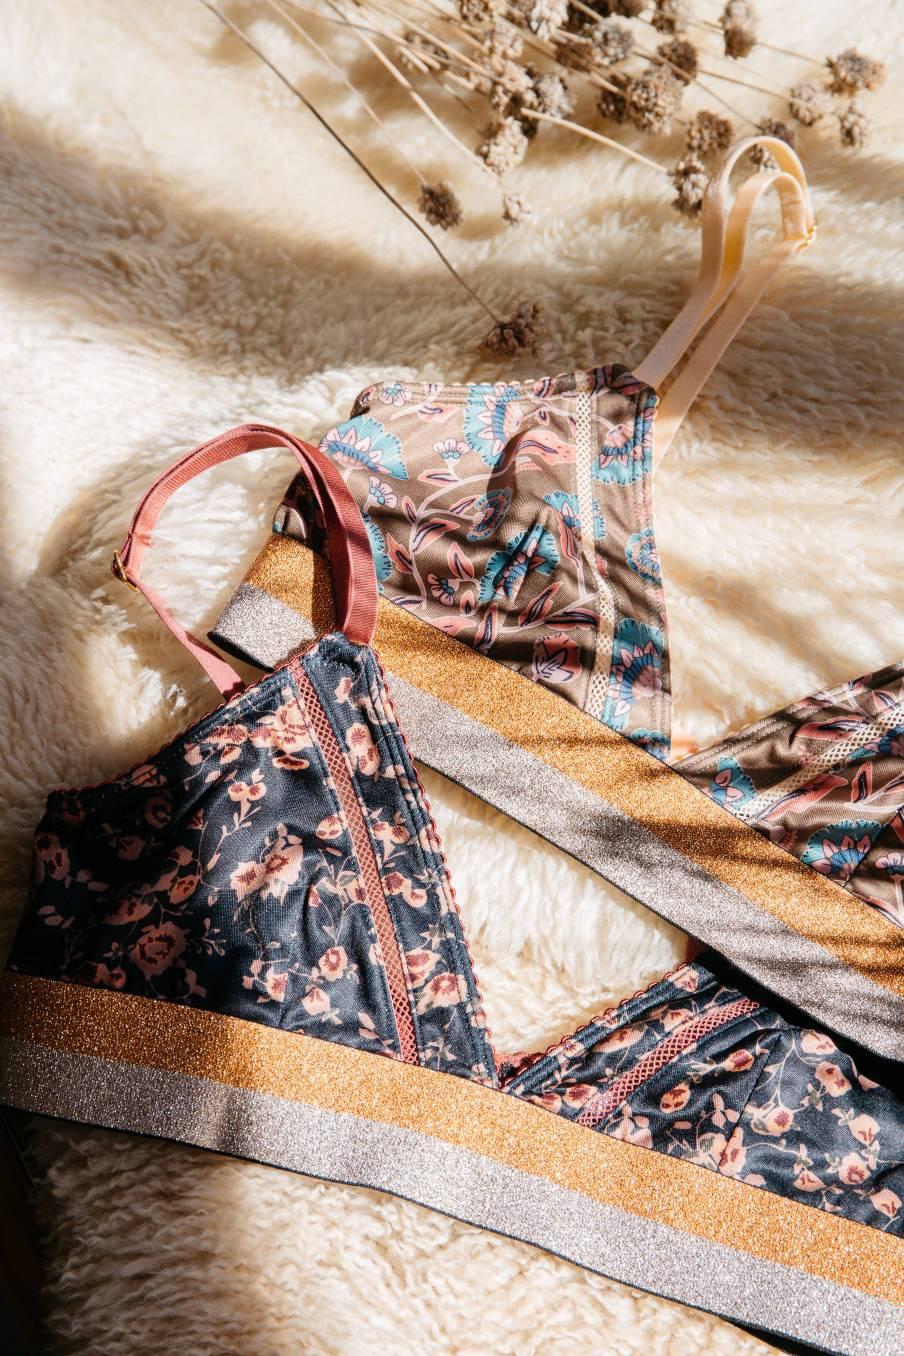 boheme chic vintage soutien-gorge femme shosha gipsy flowers